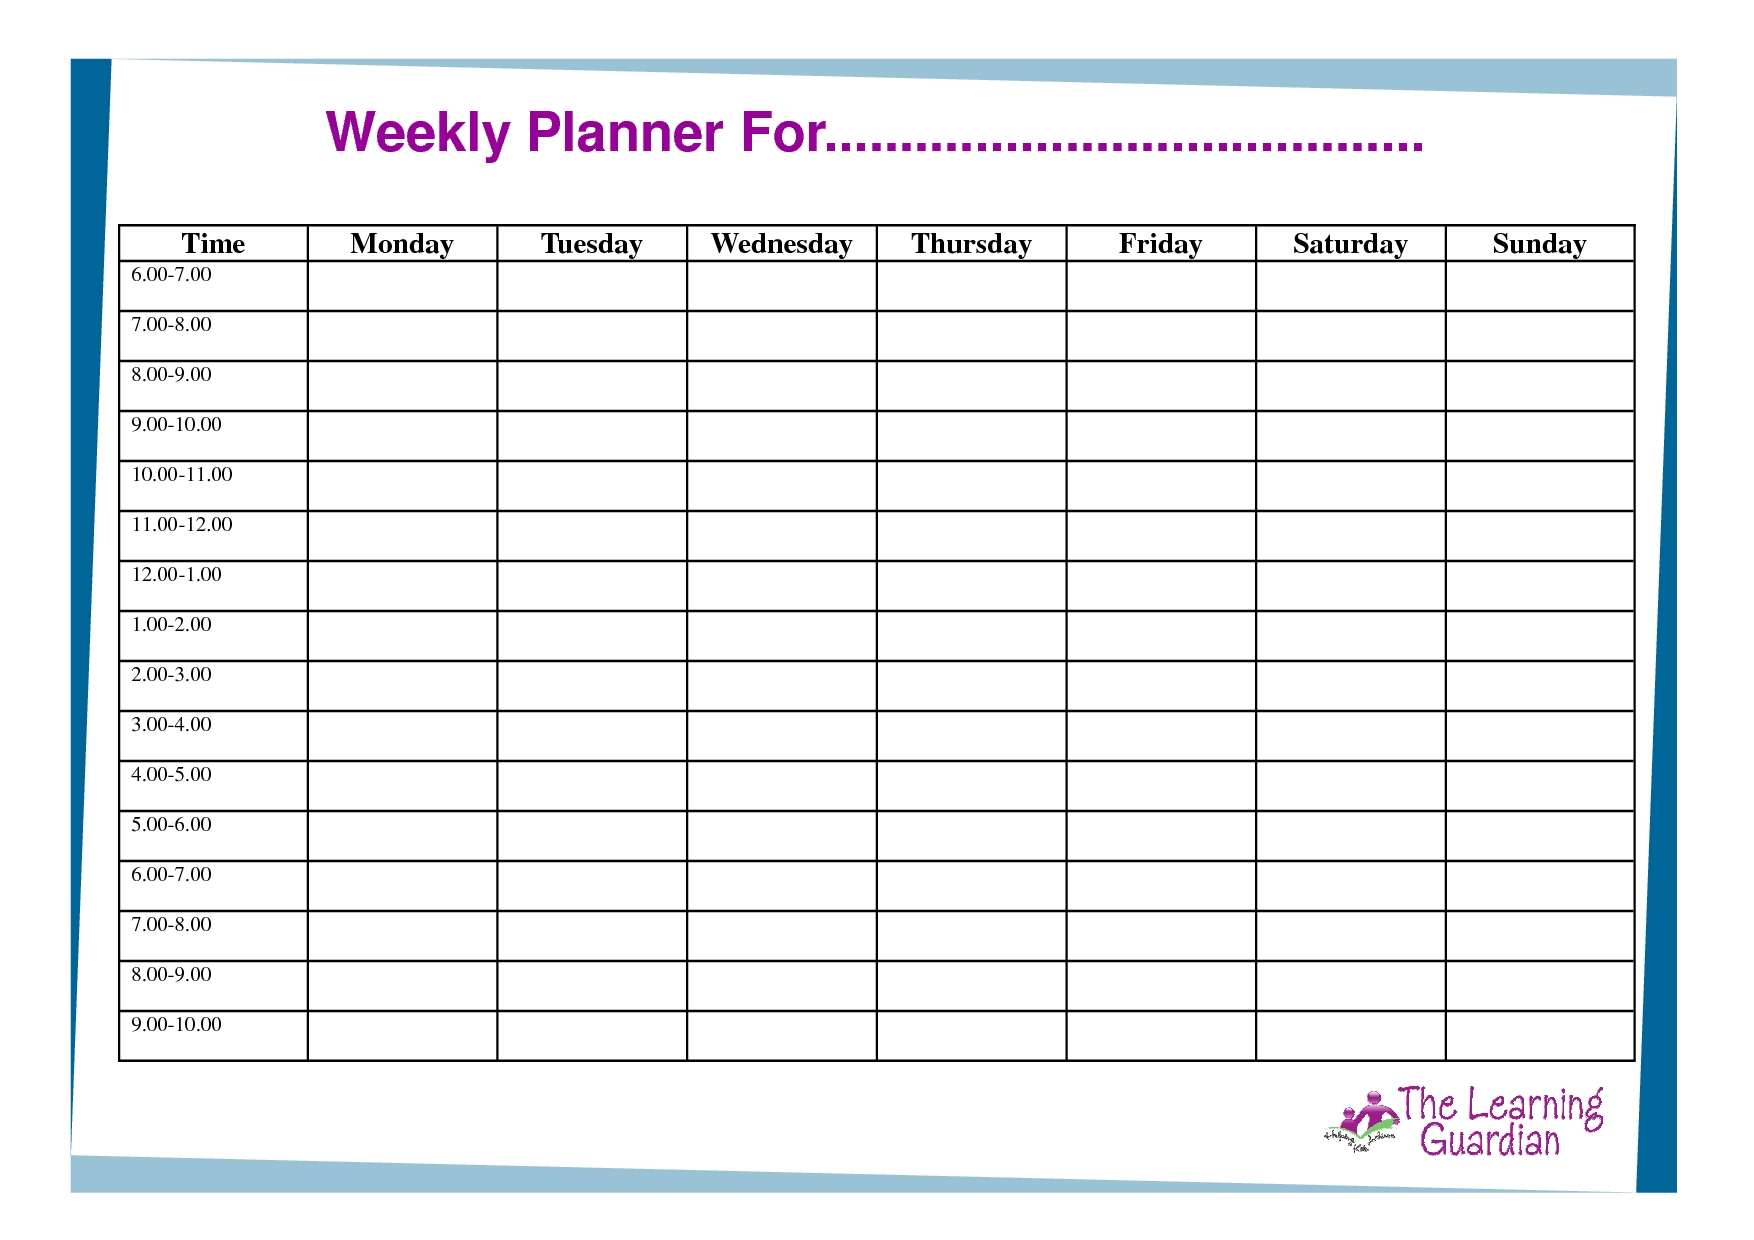 free printable weekly planner templates in 2020 | weekly